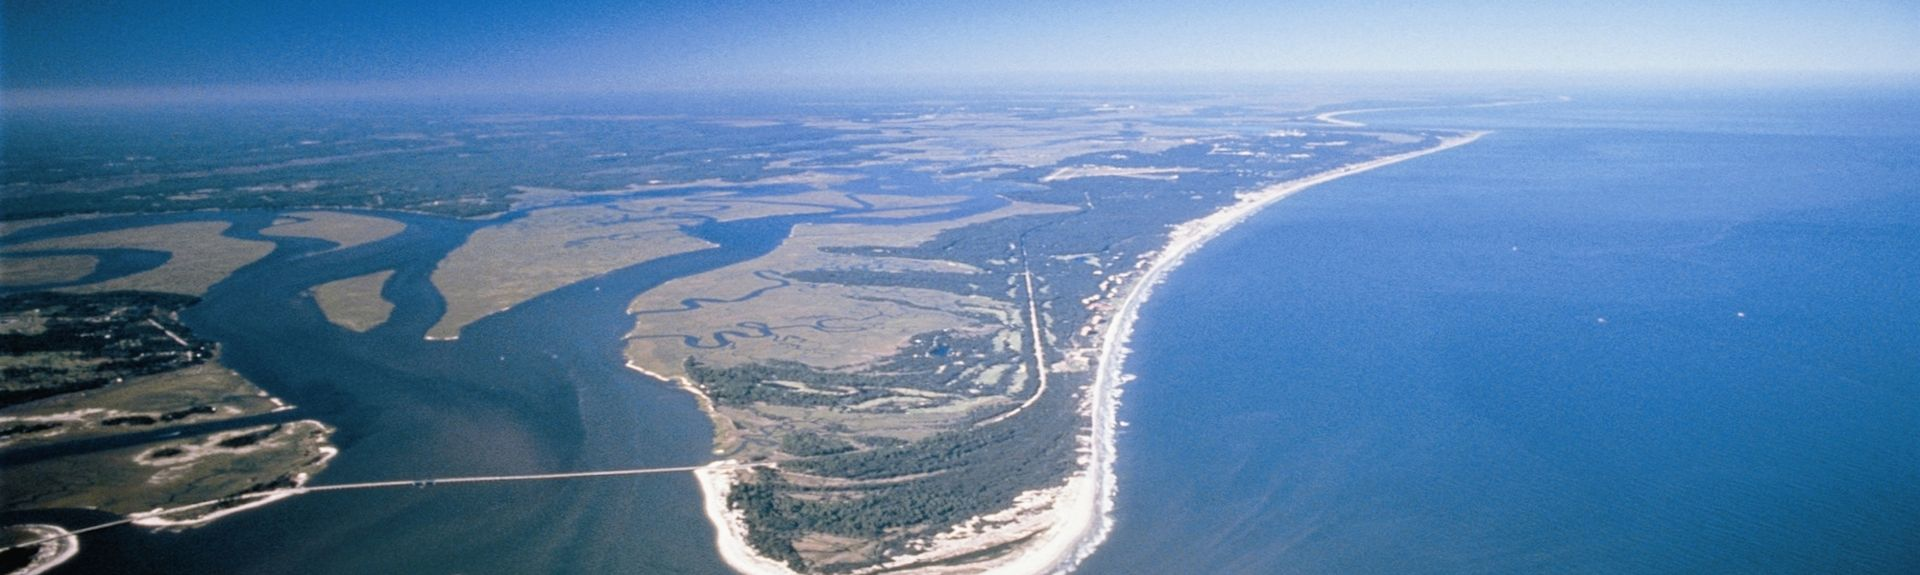 Ocean Place (Fernandina Beach, Florida, United States)